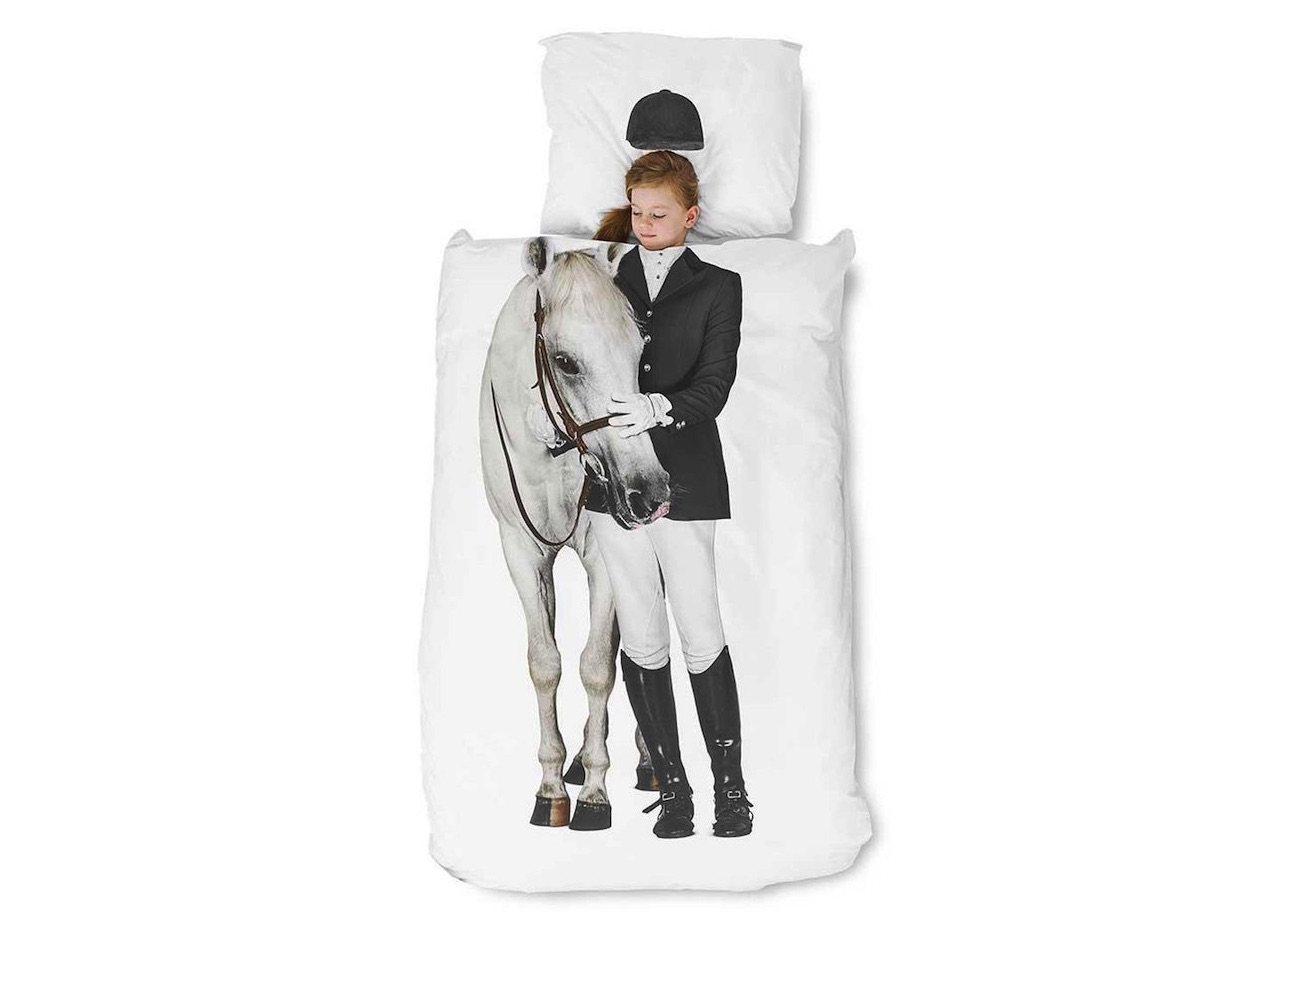 horse-duvet-set-by-snurk-02